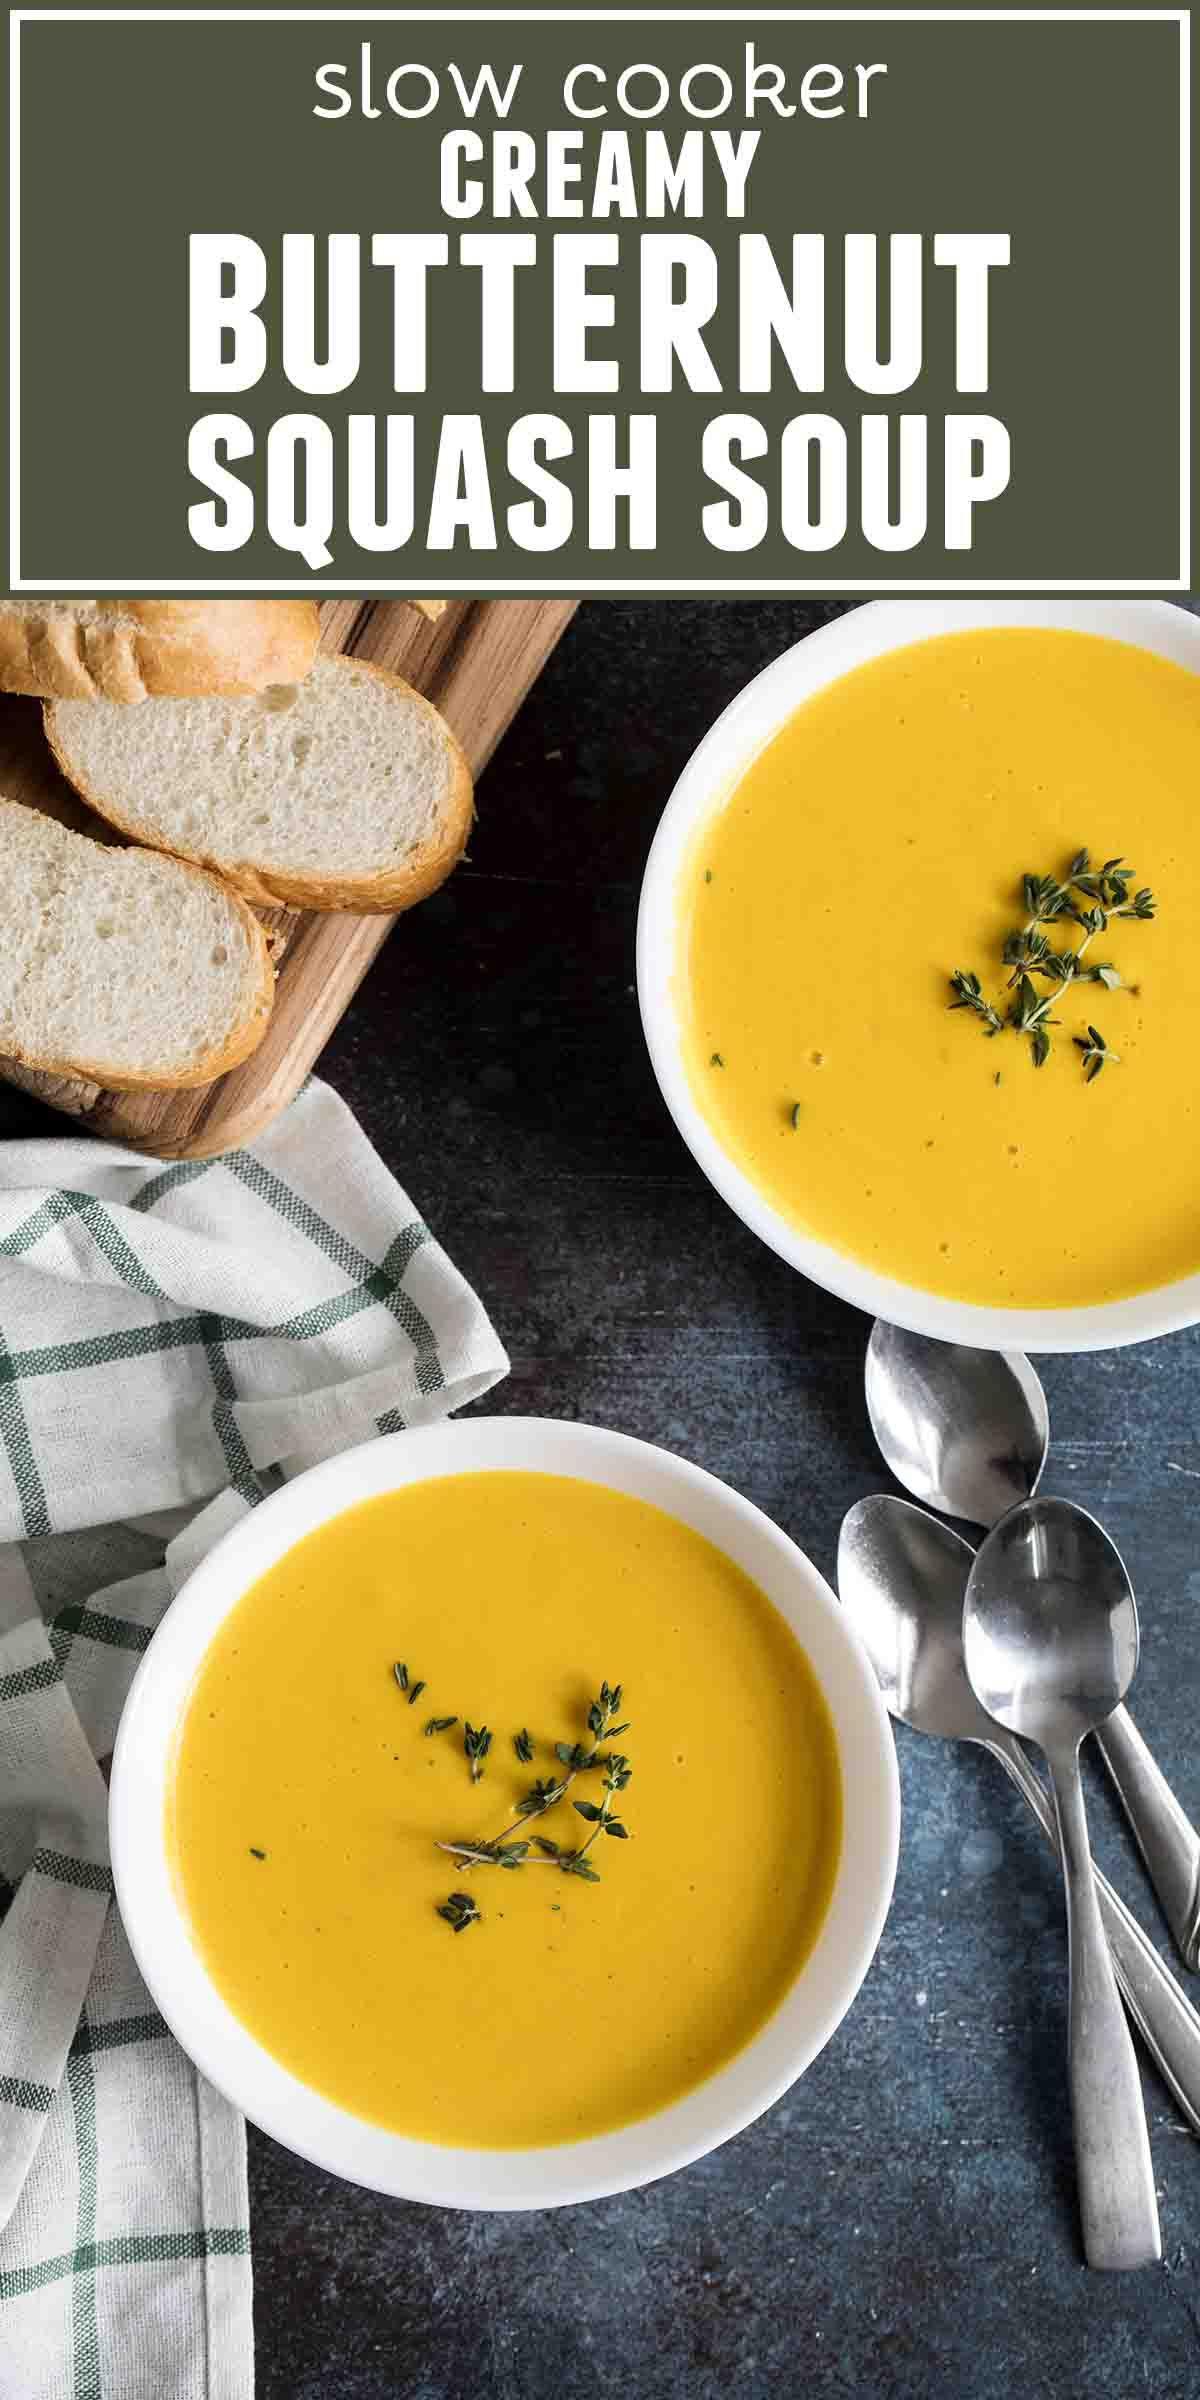 Slow Cooker Creamy Butternut Squash Soup #butternutsquashsoup